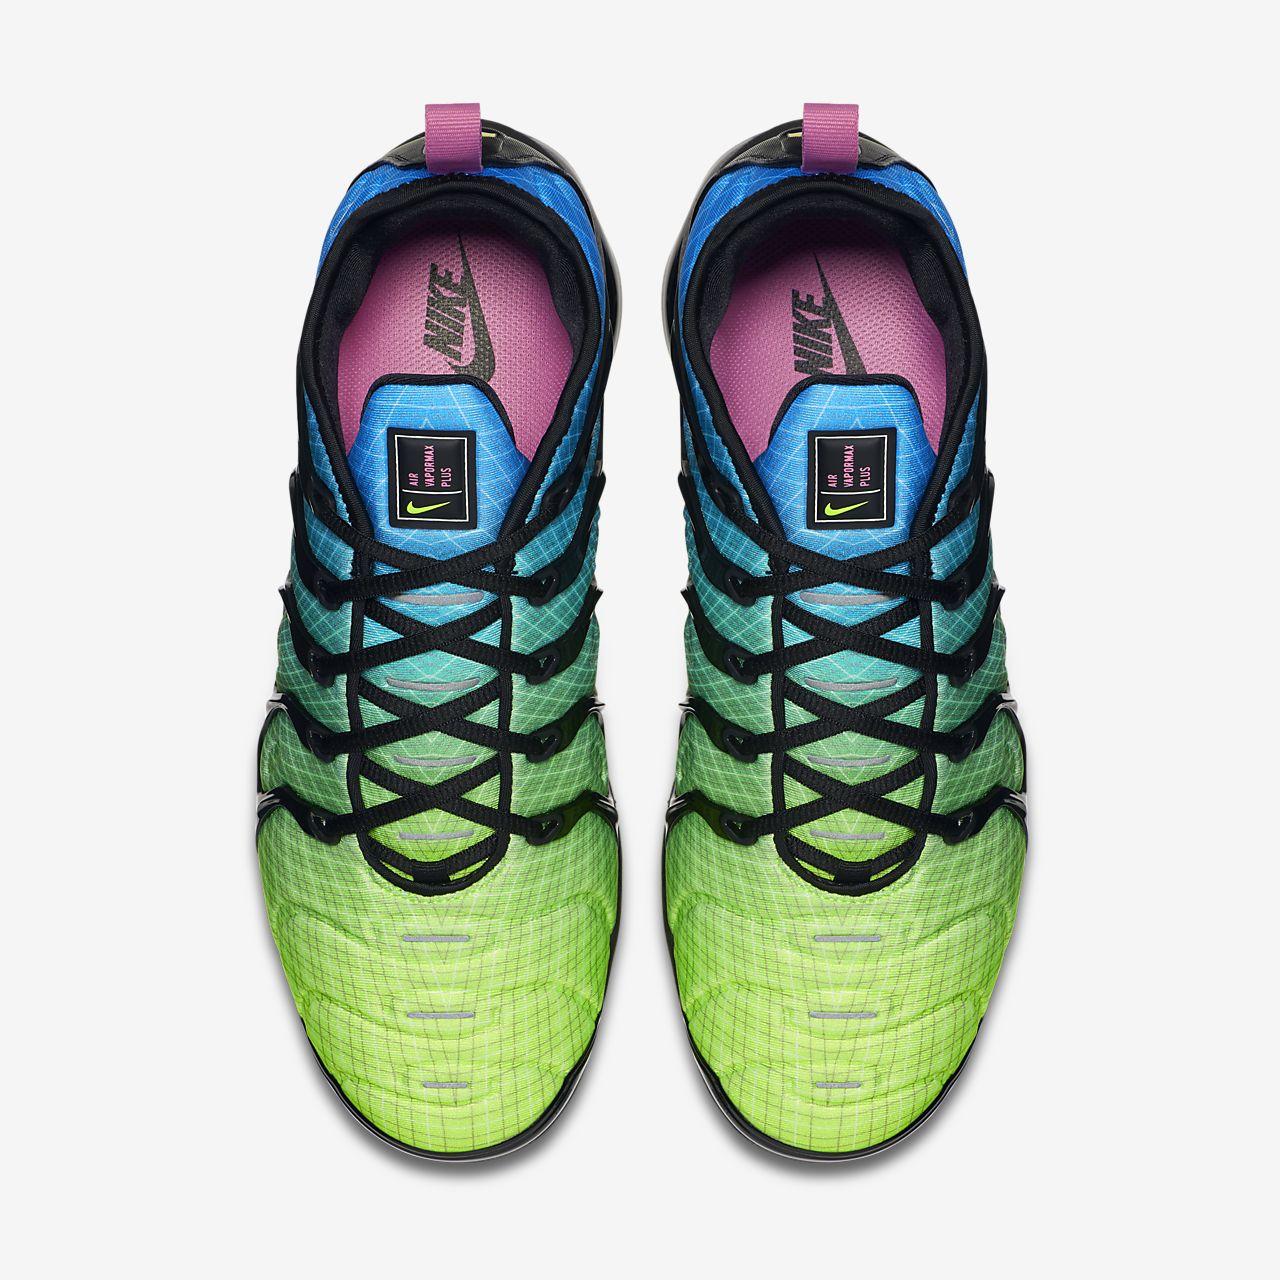 98a921ad Nike Air VaporMax Plus Men's Shoe. Nike.com